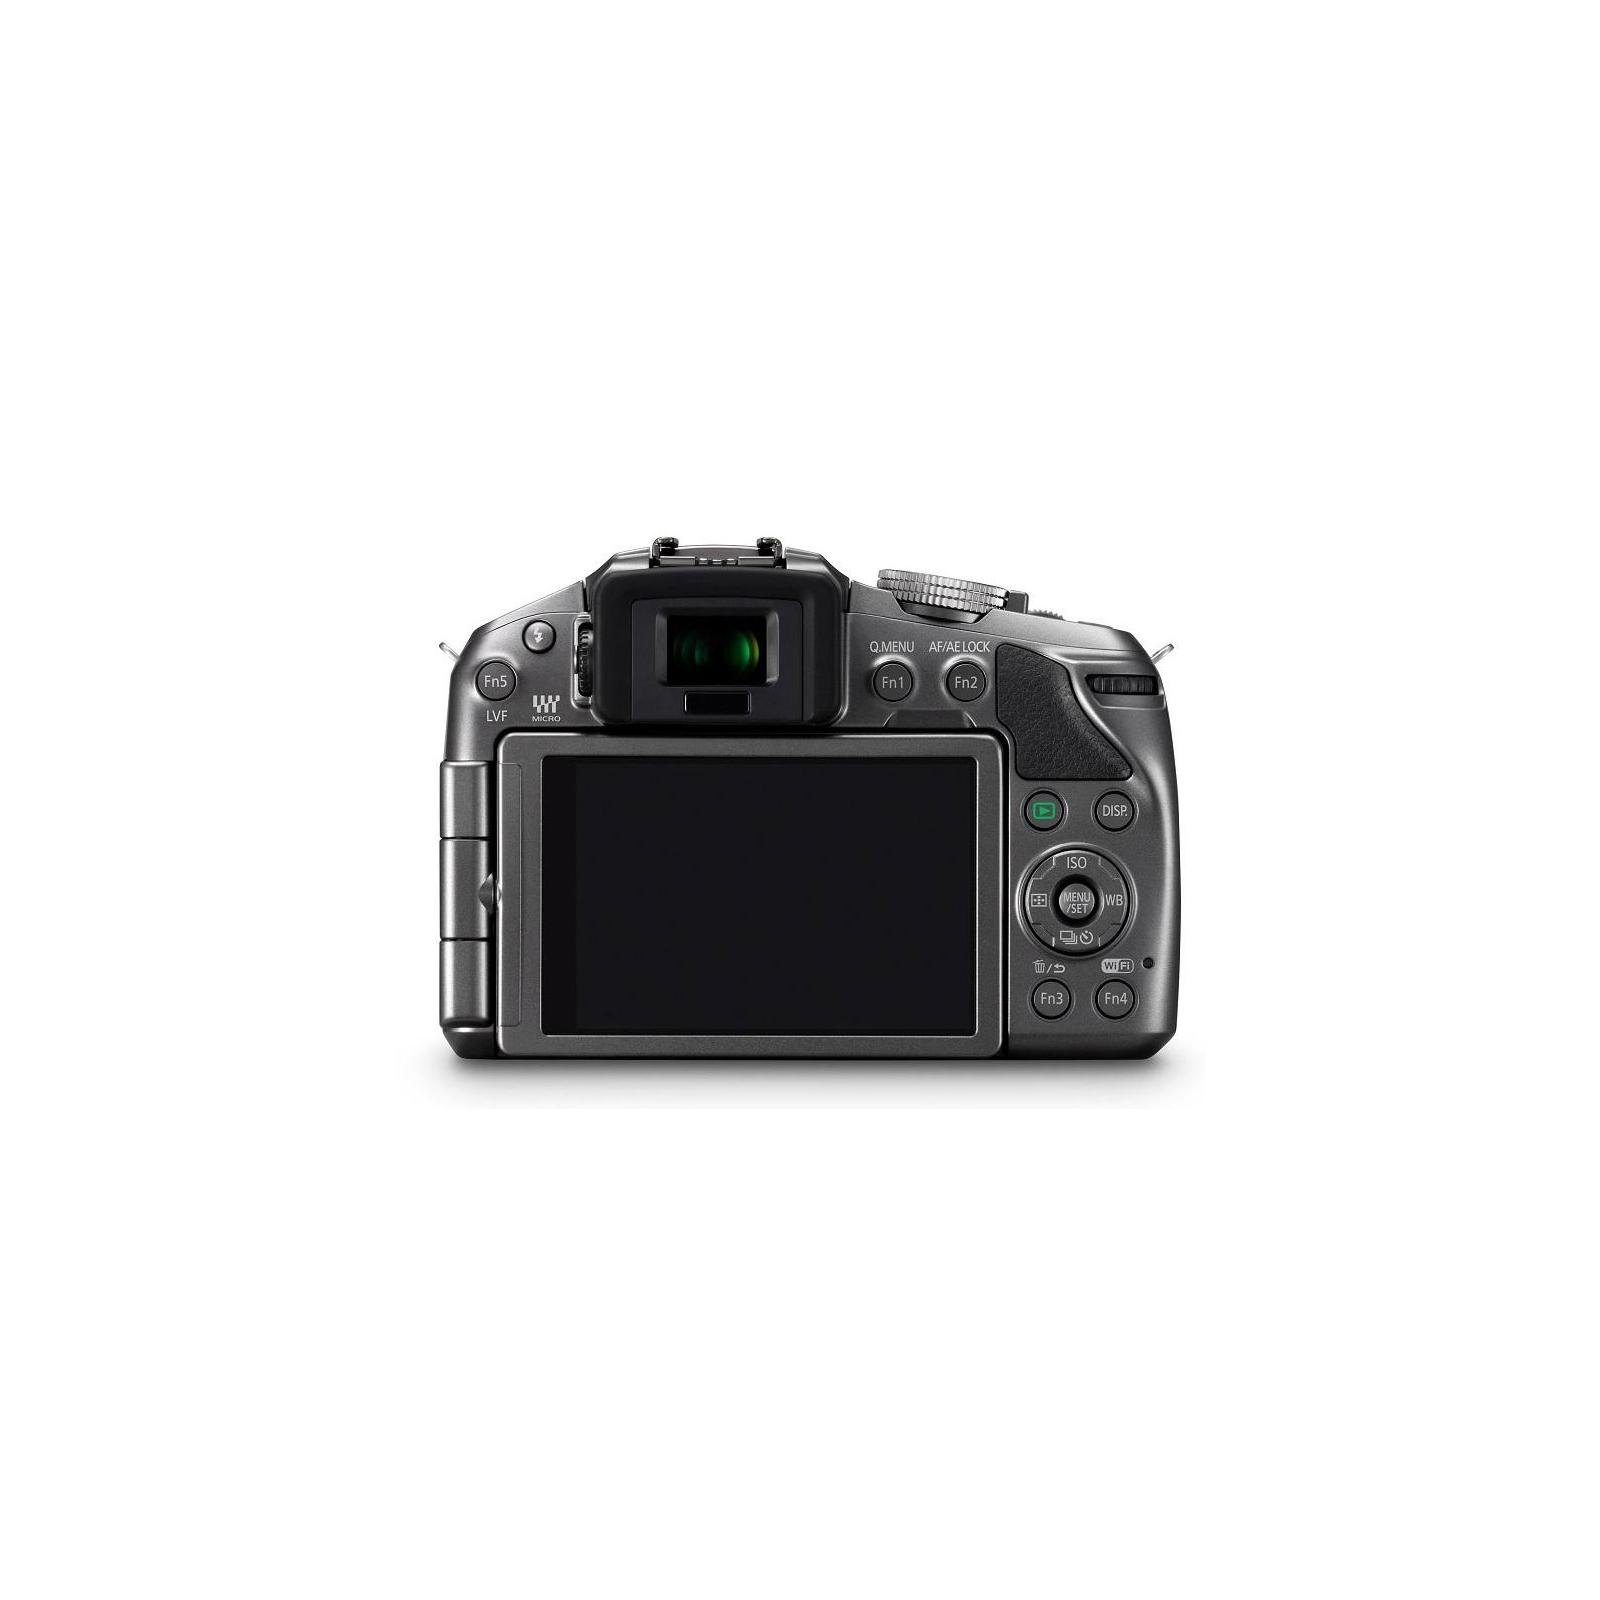 Цифровой фотоаппарат PANASONIC DMC-G6 silver 14-42 kit (DMC-G6KEE-S) изображение 2